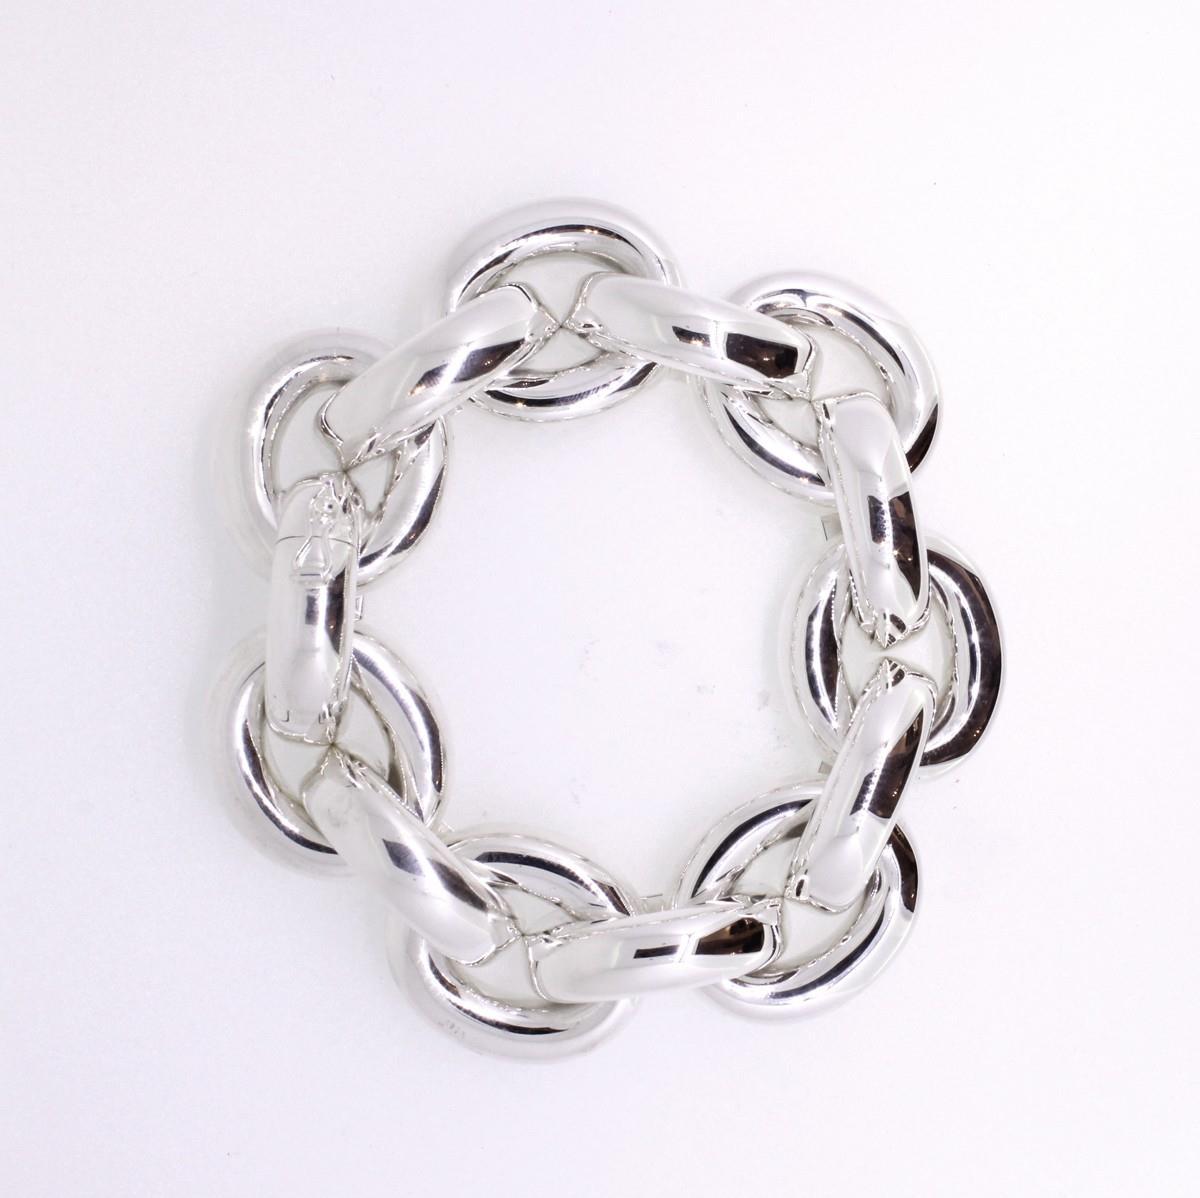 Armband 925 Silber - Emil Brenk - 948.3965.21